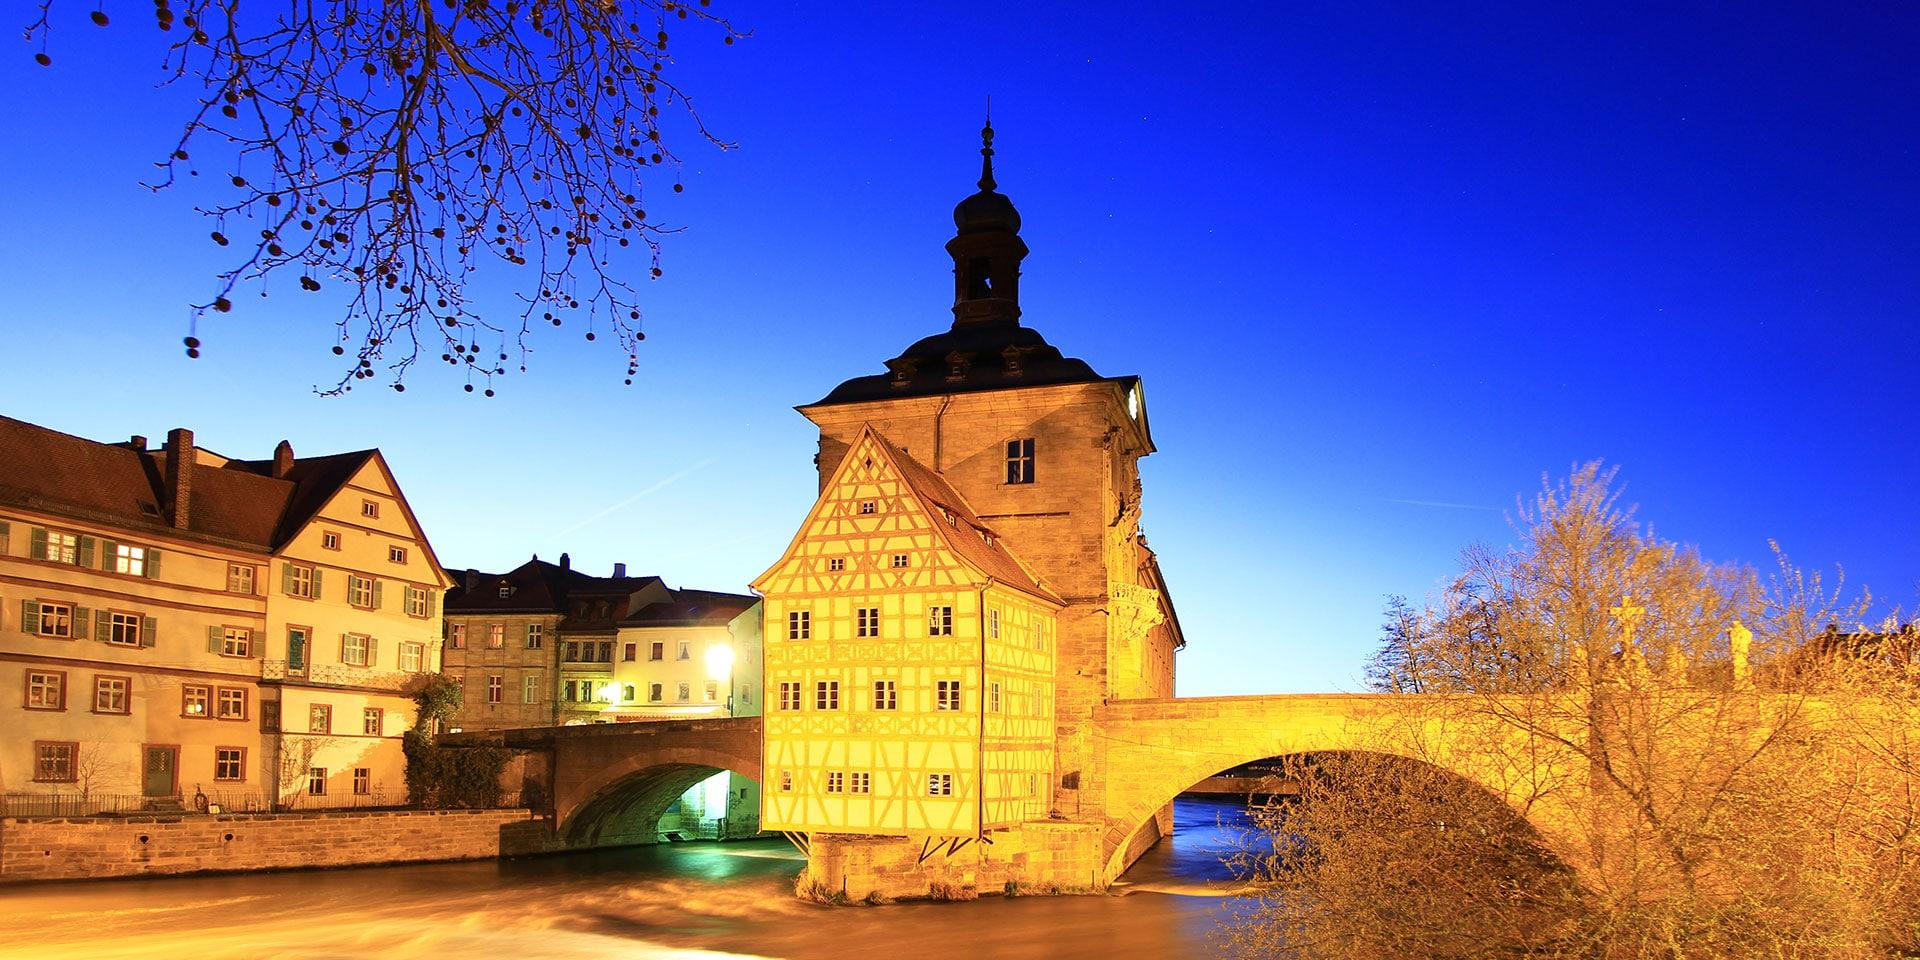 altes rathaus - Altes Rathaus Bamberg